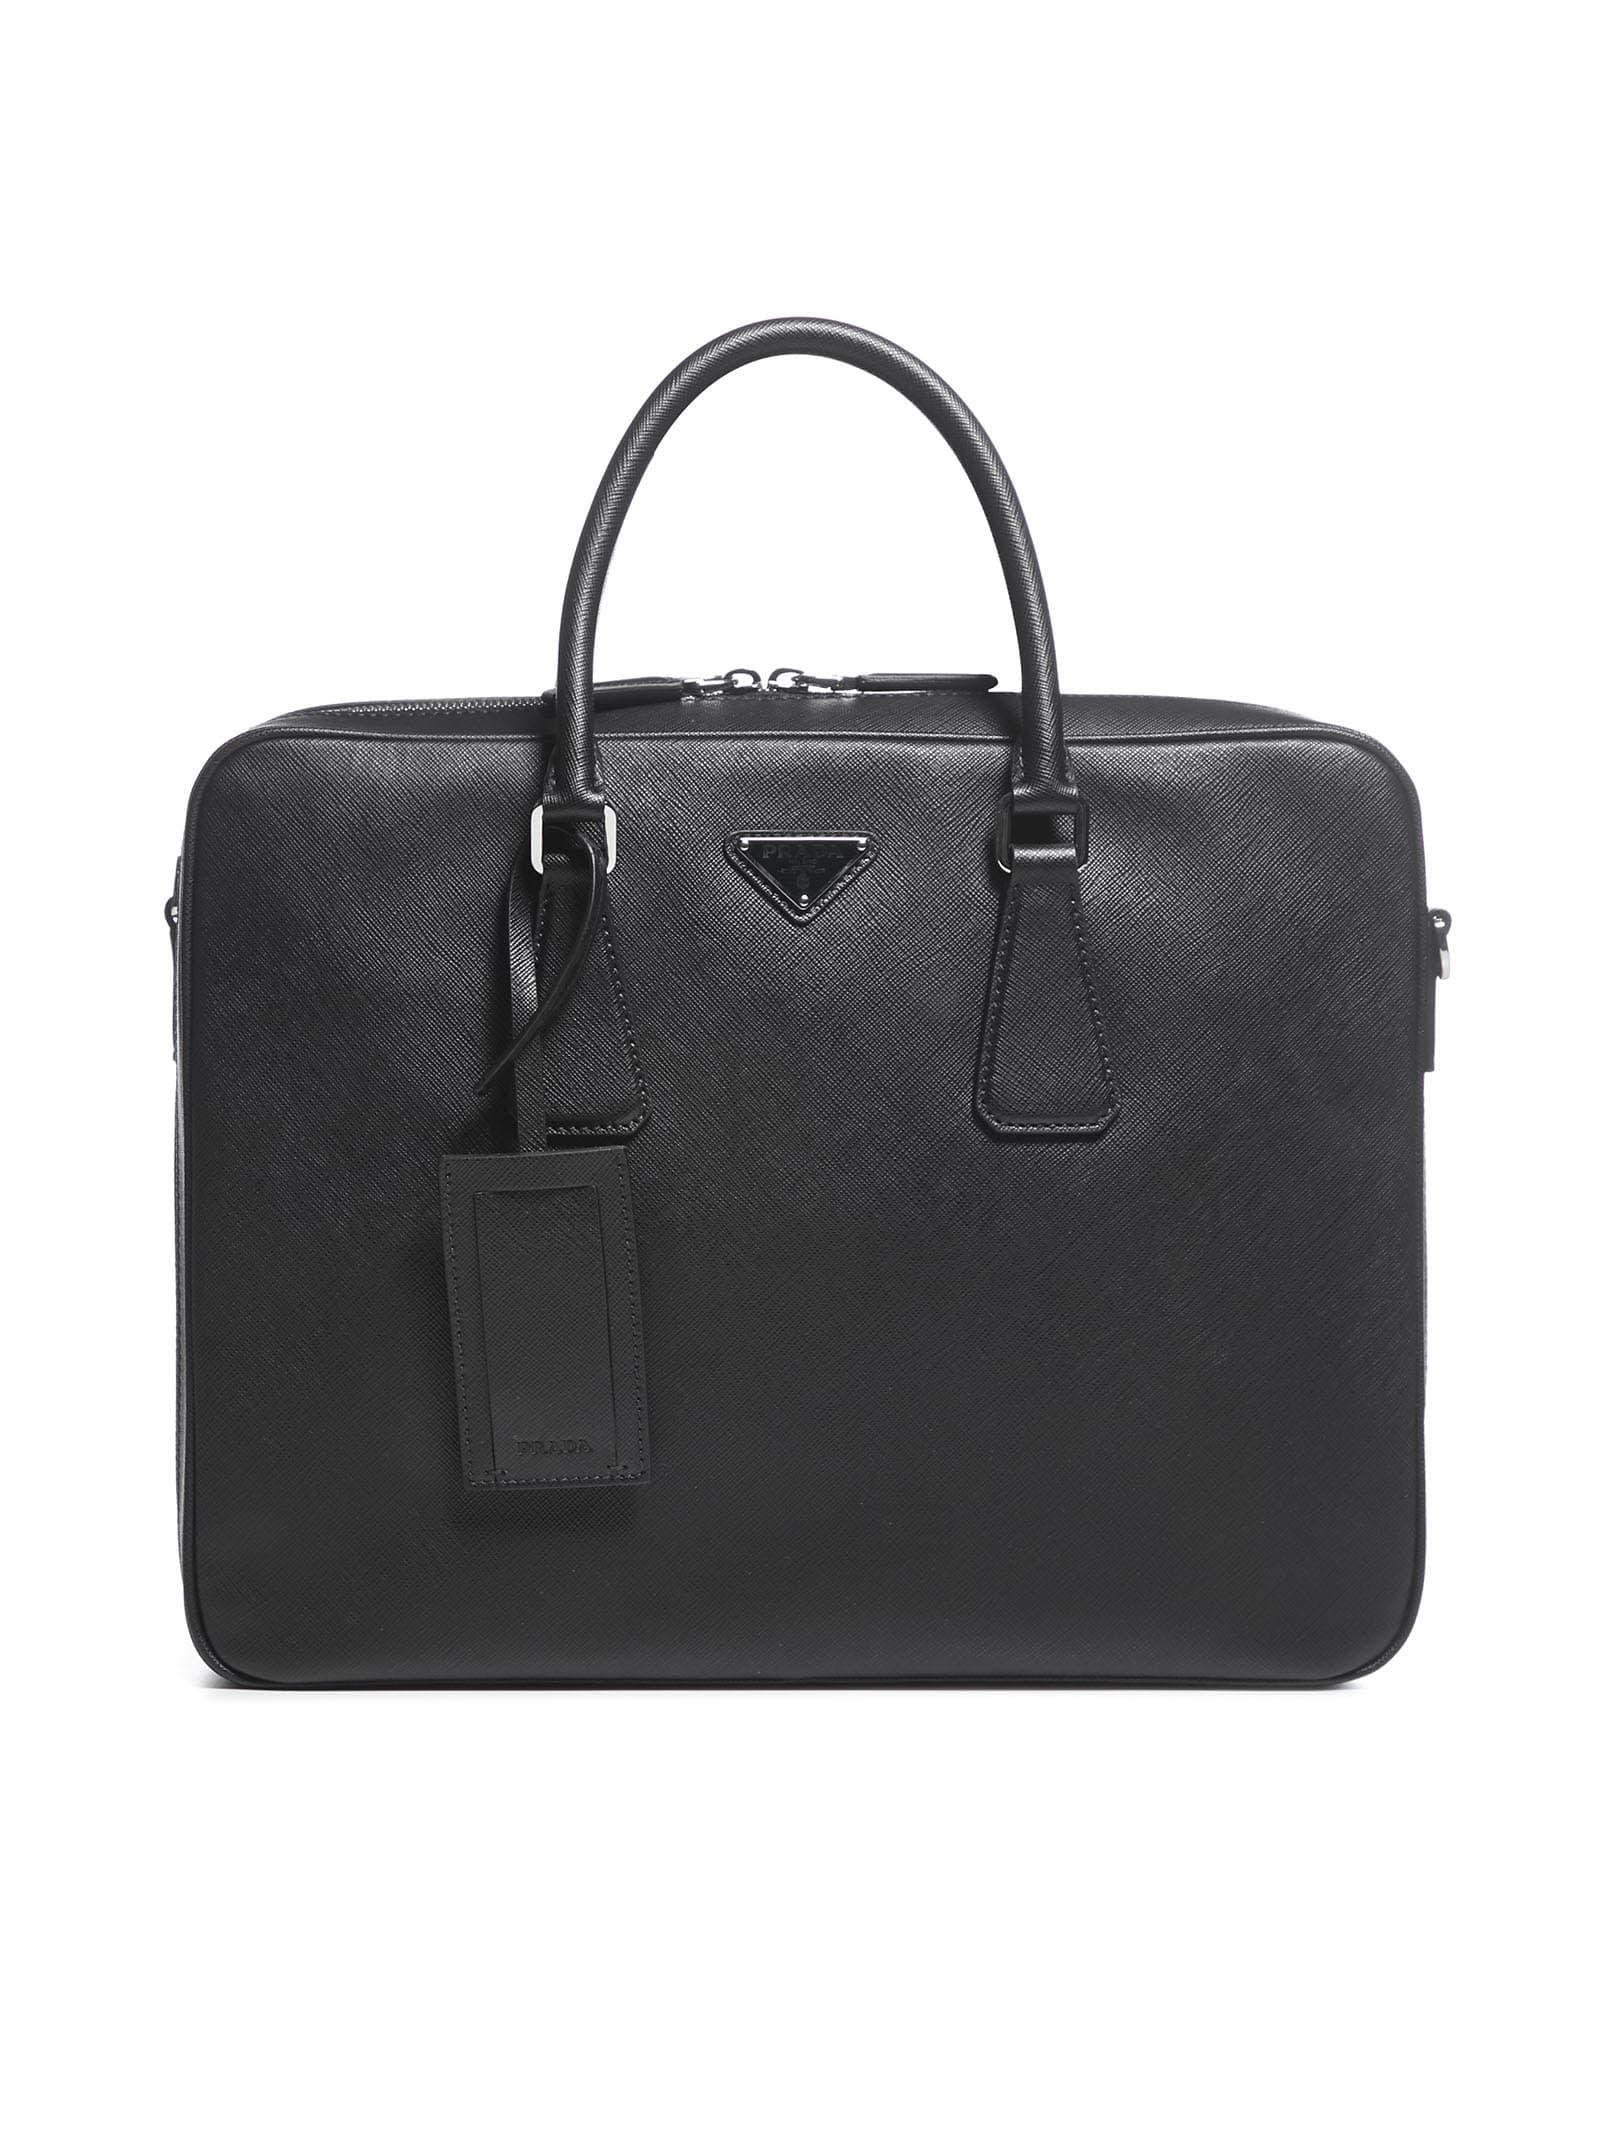 Prada Briefcase Tote